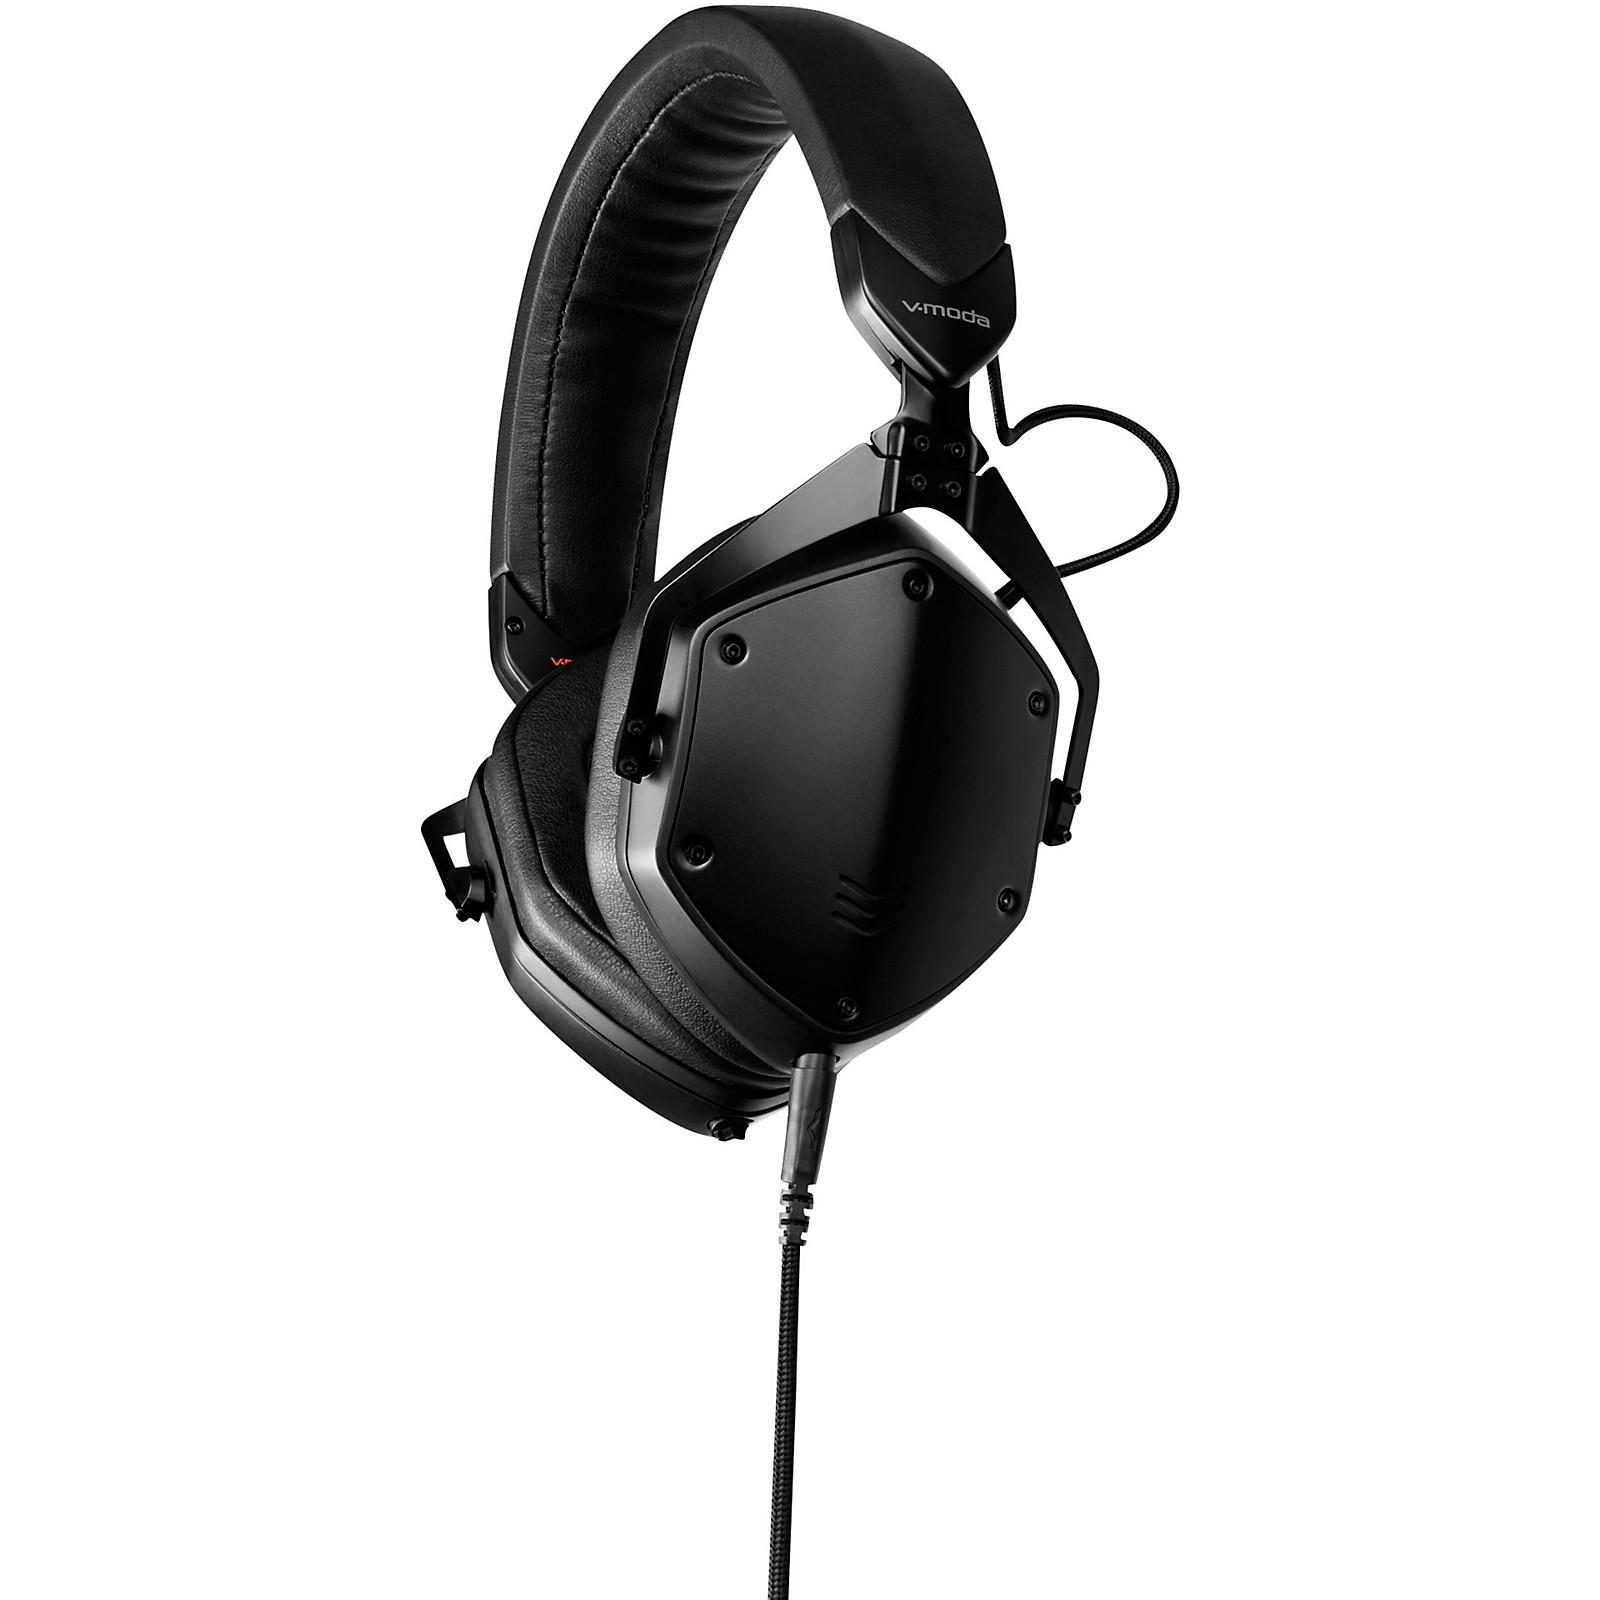 V-MODA M200-BK Studio Headphones